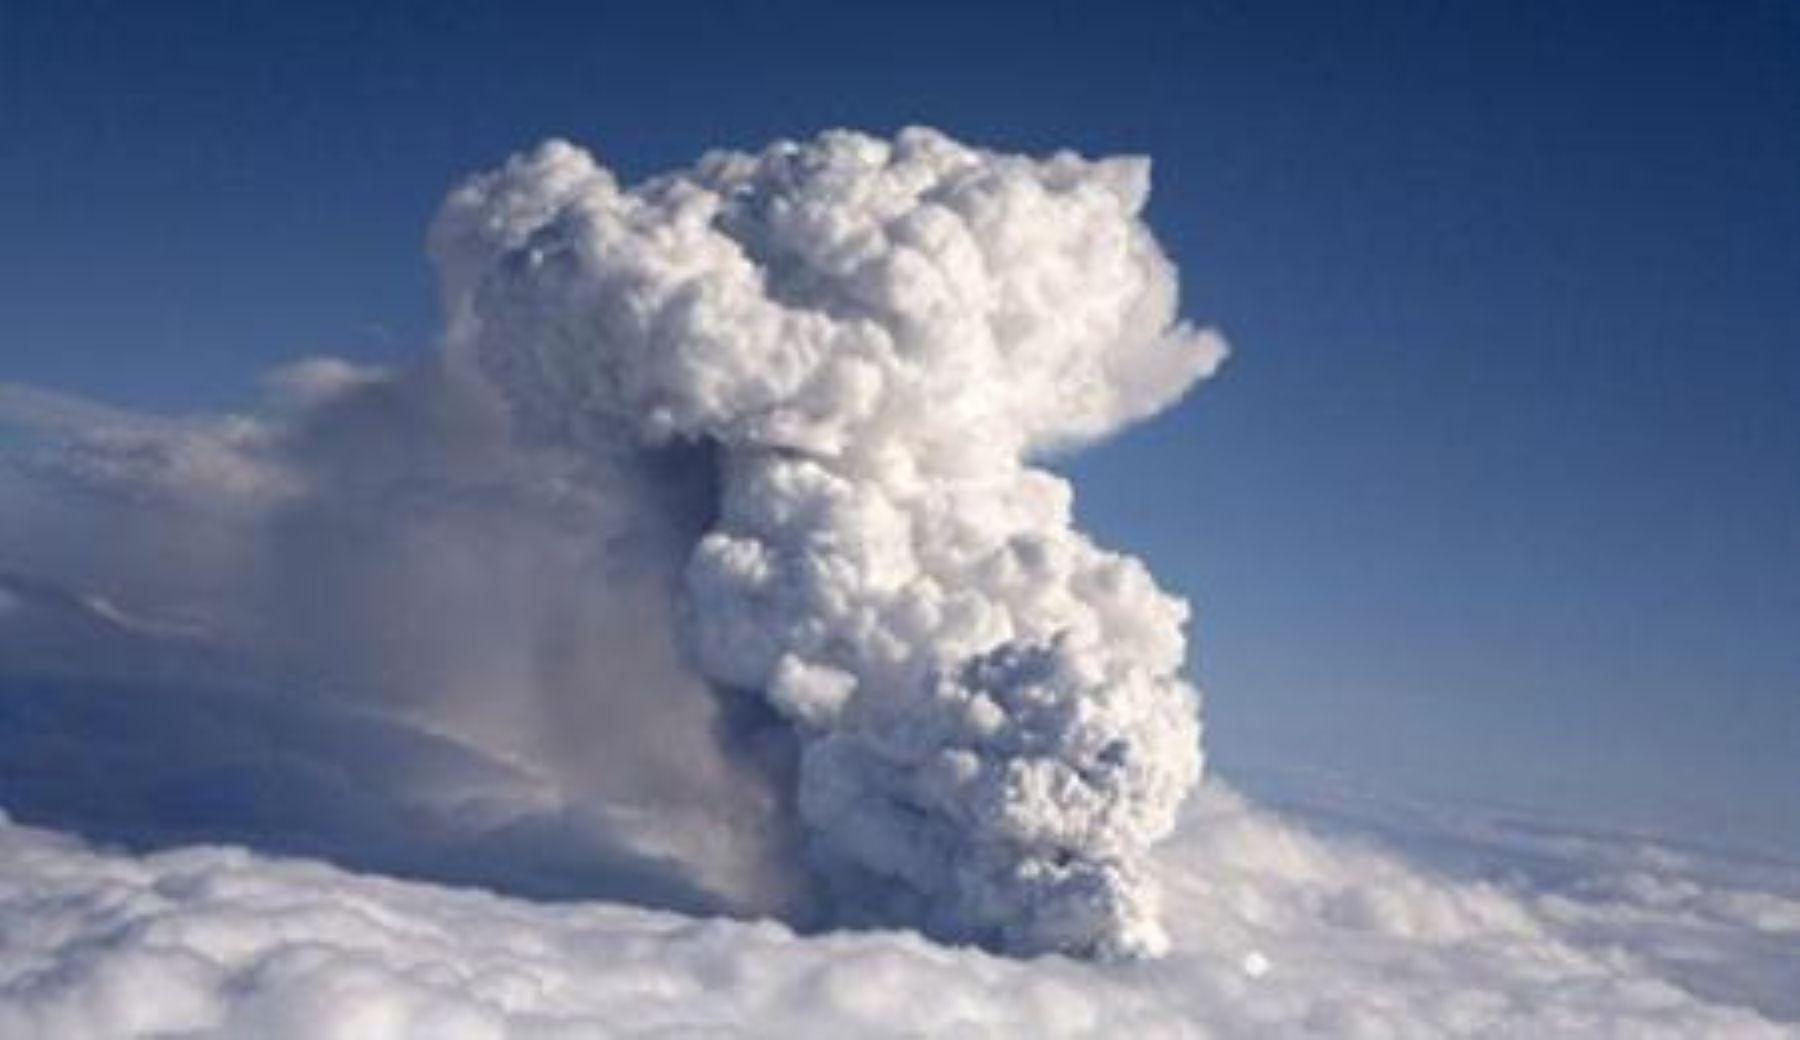 Erupción de volcán en Islandia. Foto: ANDINA/Internet